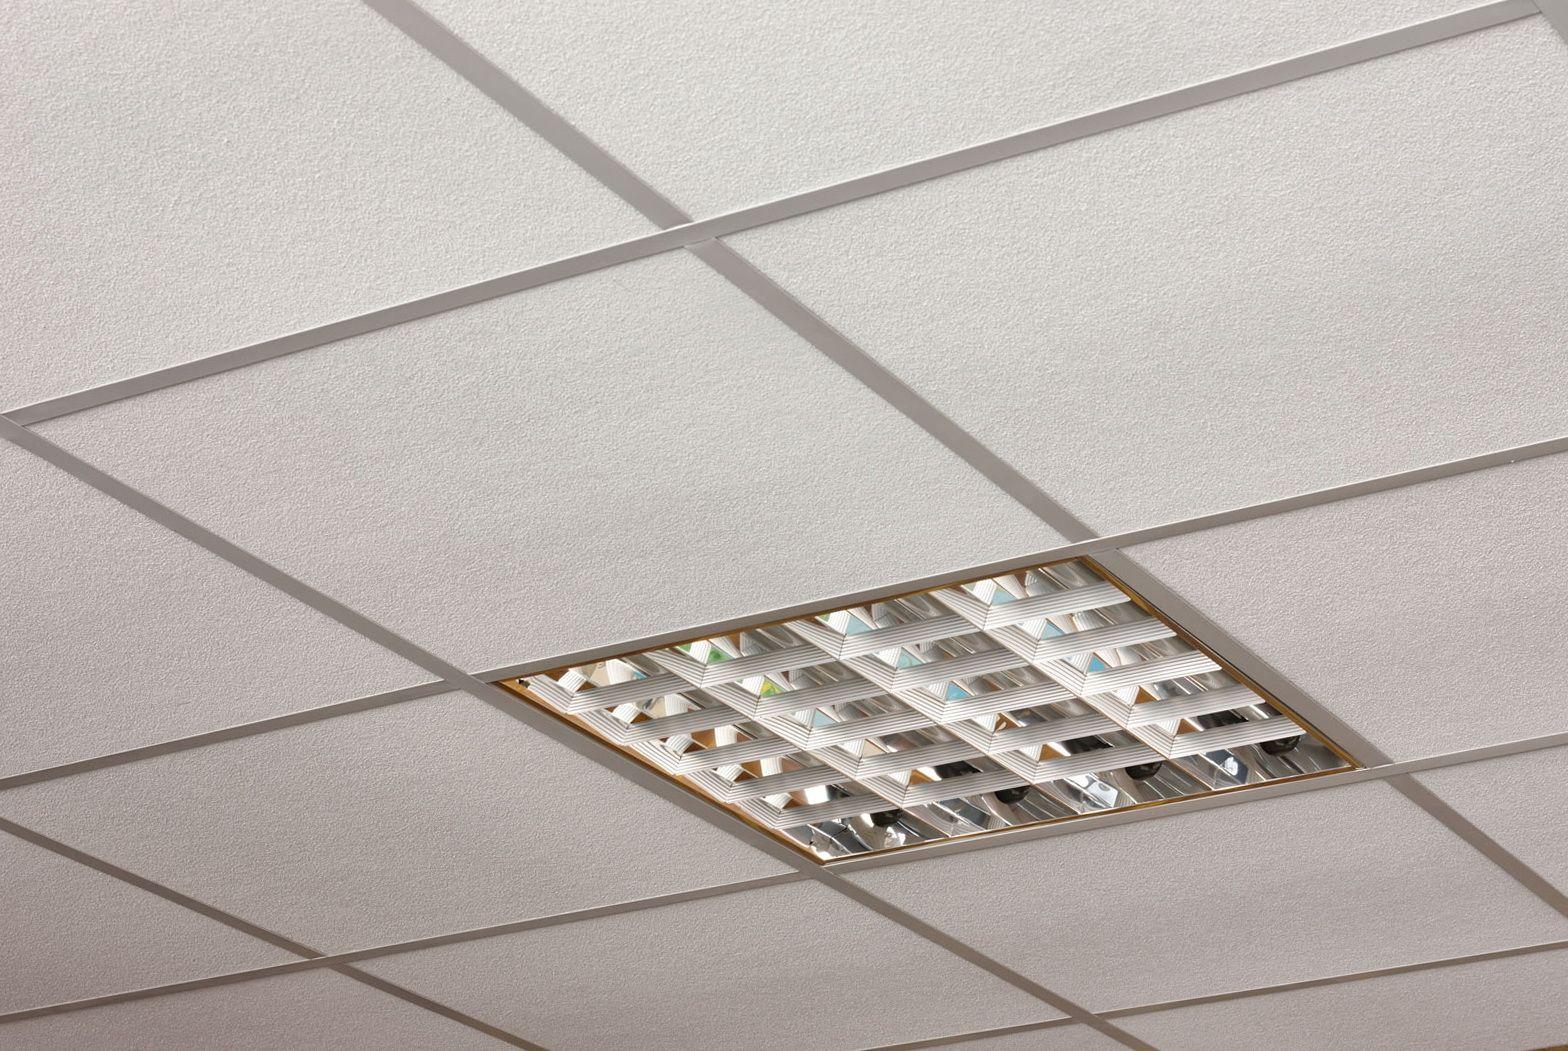 22 fluorescent light fixture drop ceiling httpdeai rankfo 22 fluorescent light fixture drop ceiling mozeypictures Gallery